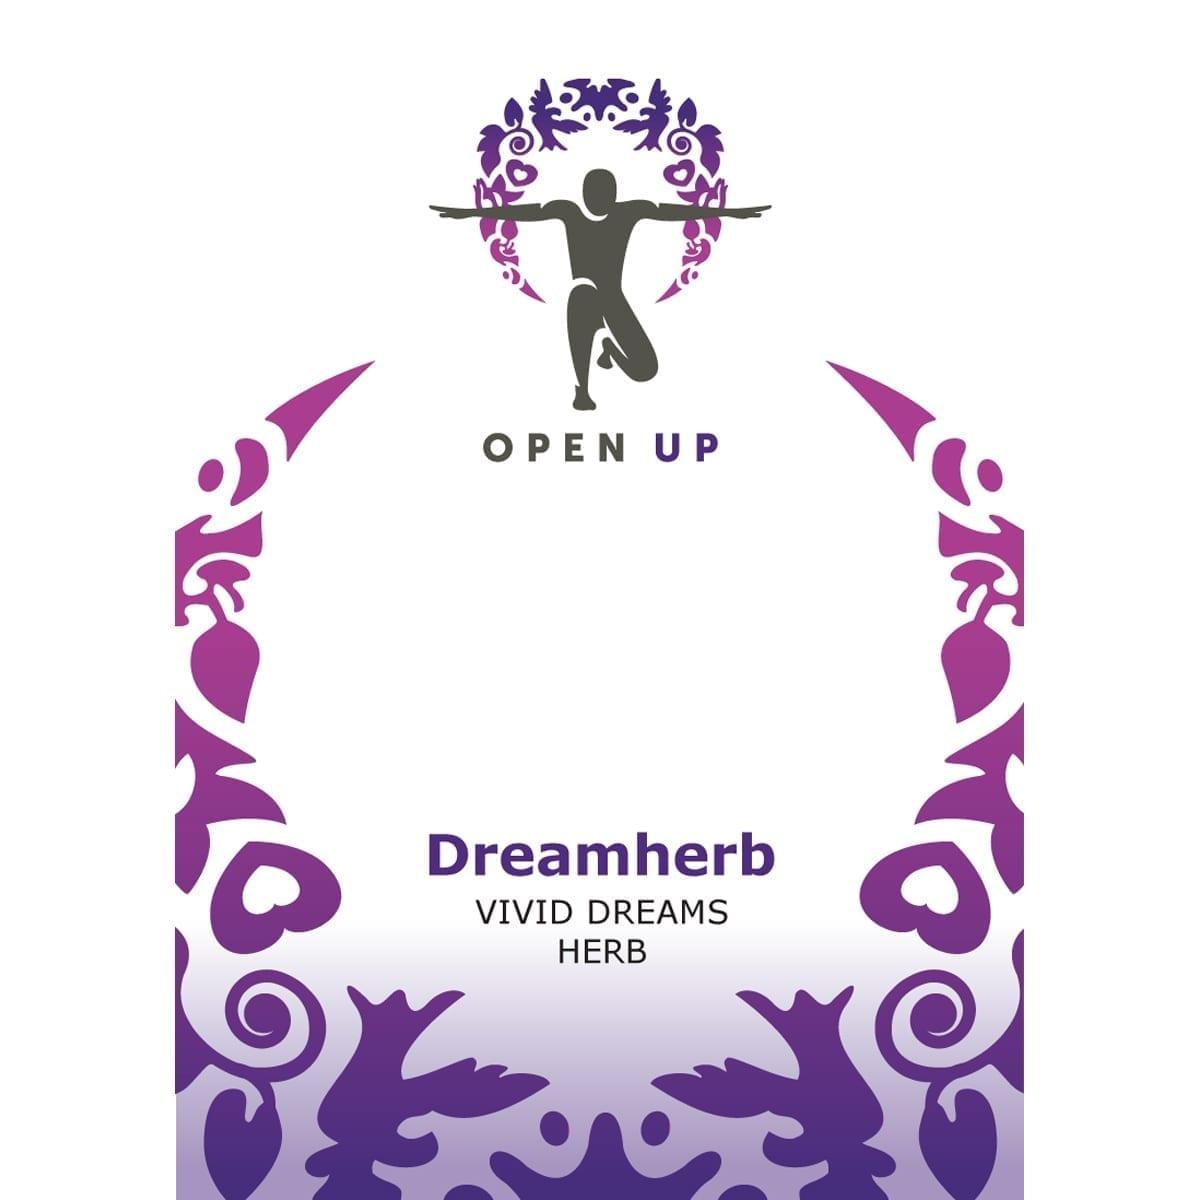 Dreamherb